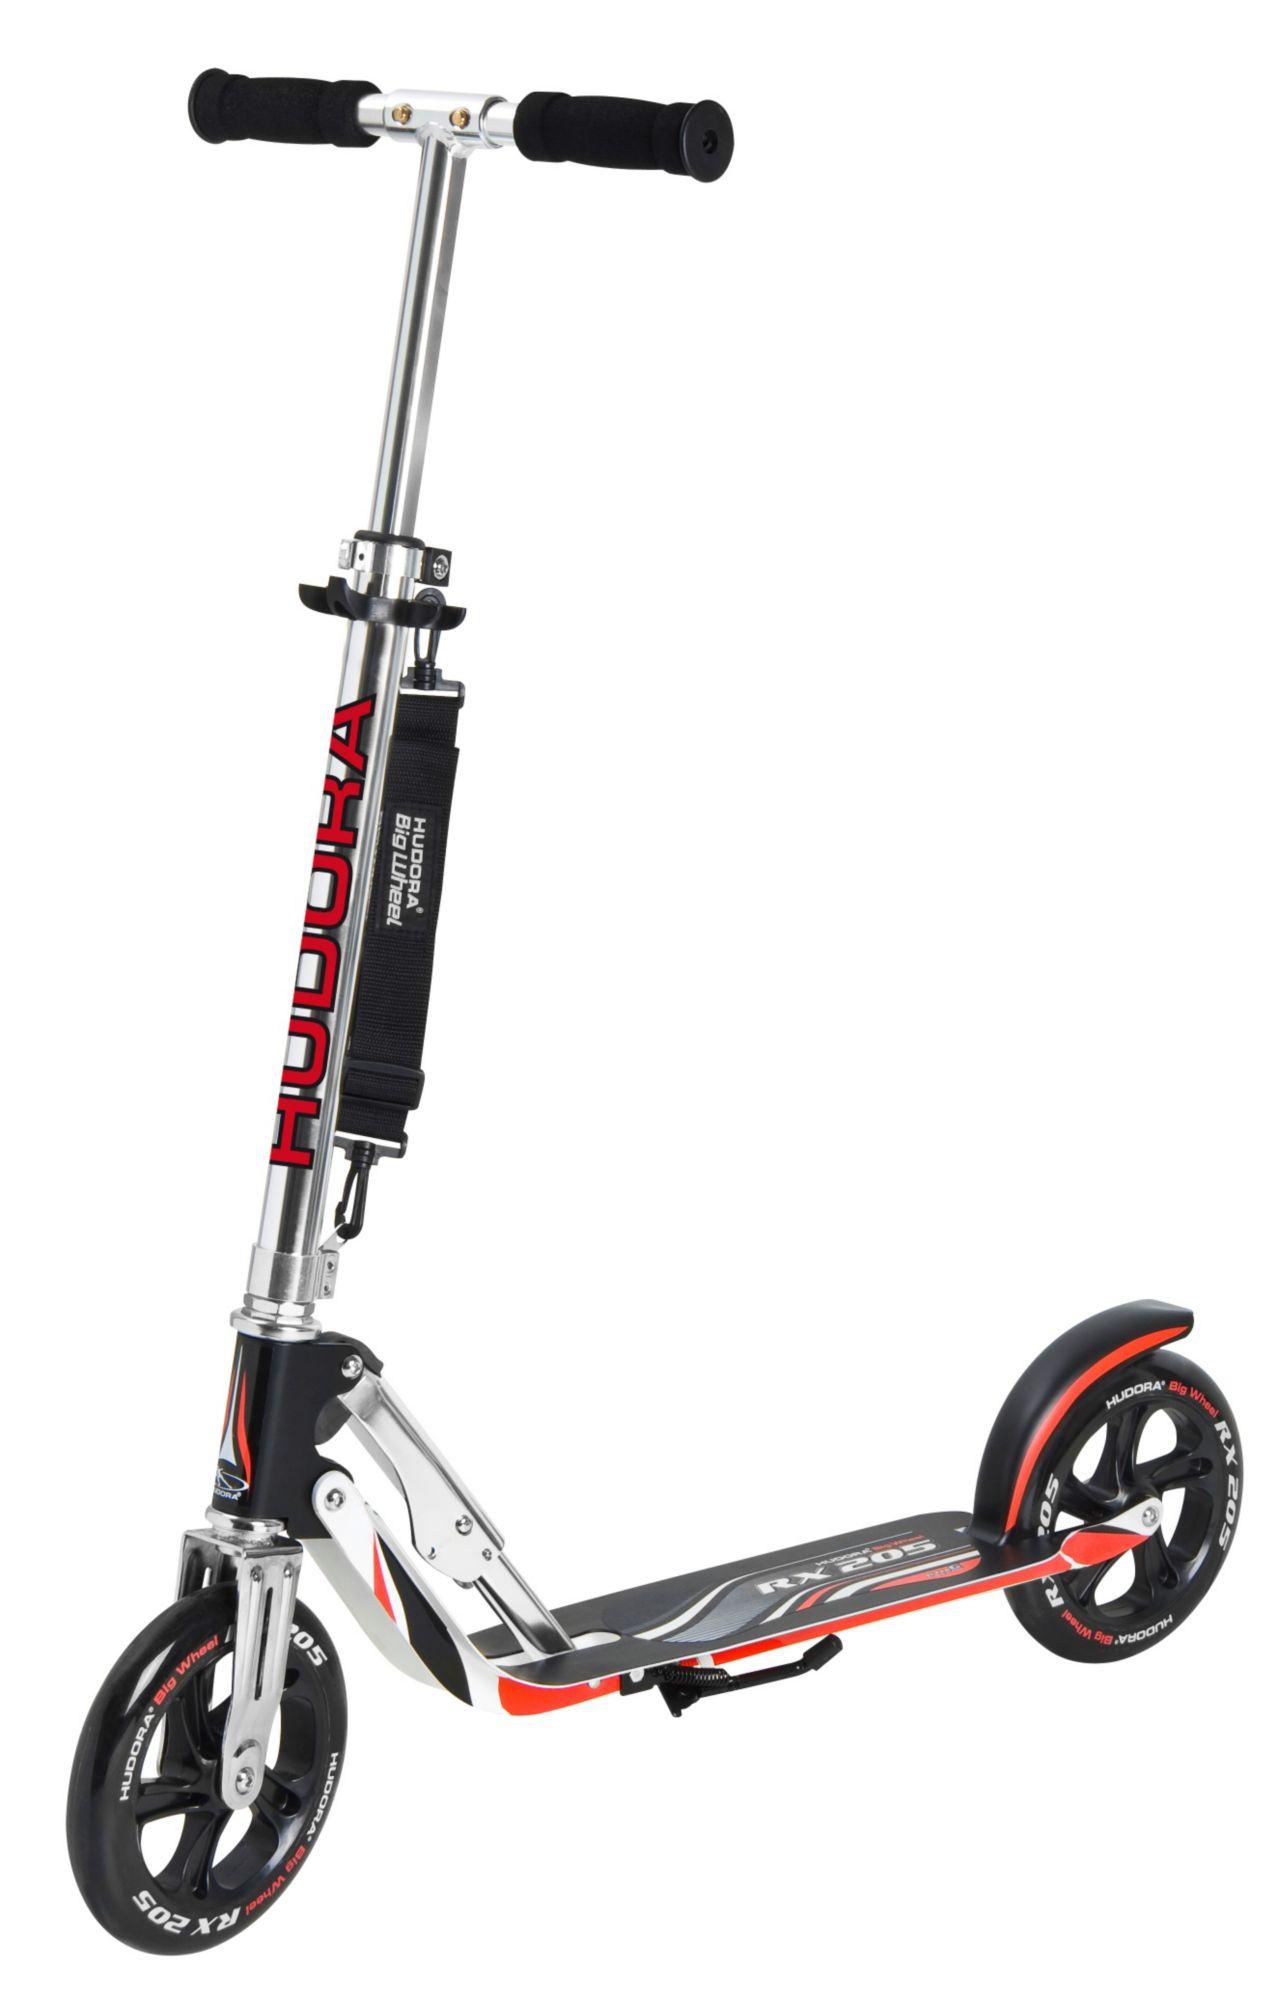 HUDORA Big Wheel RX 205, Scooter